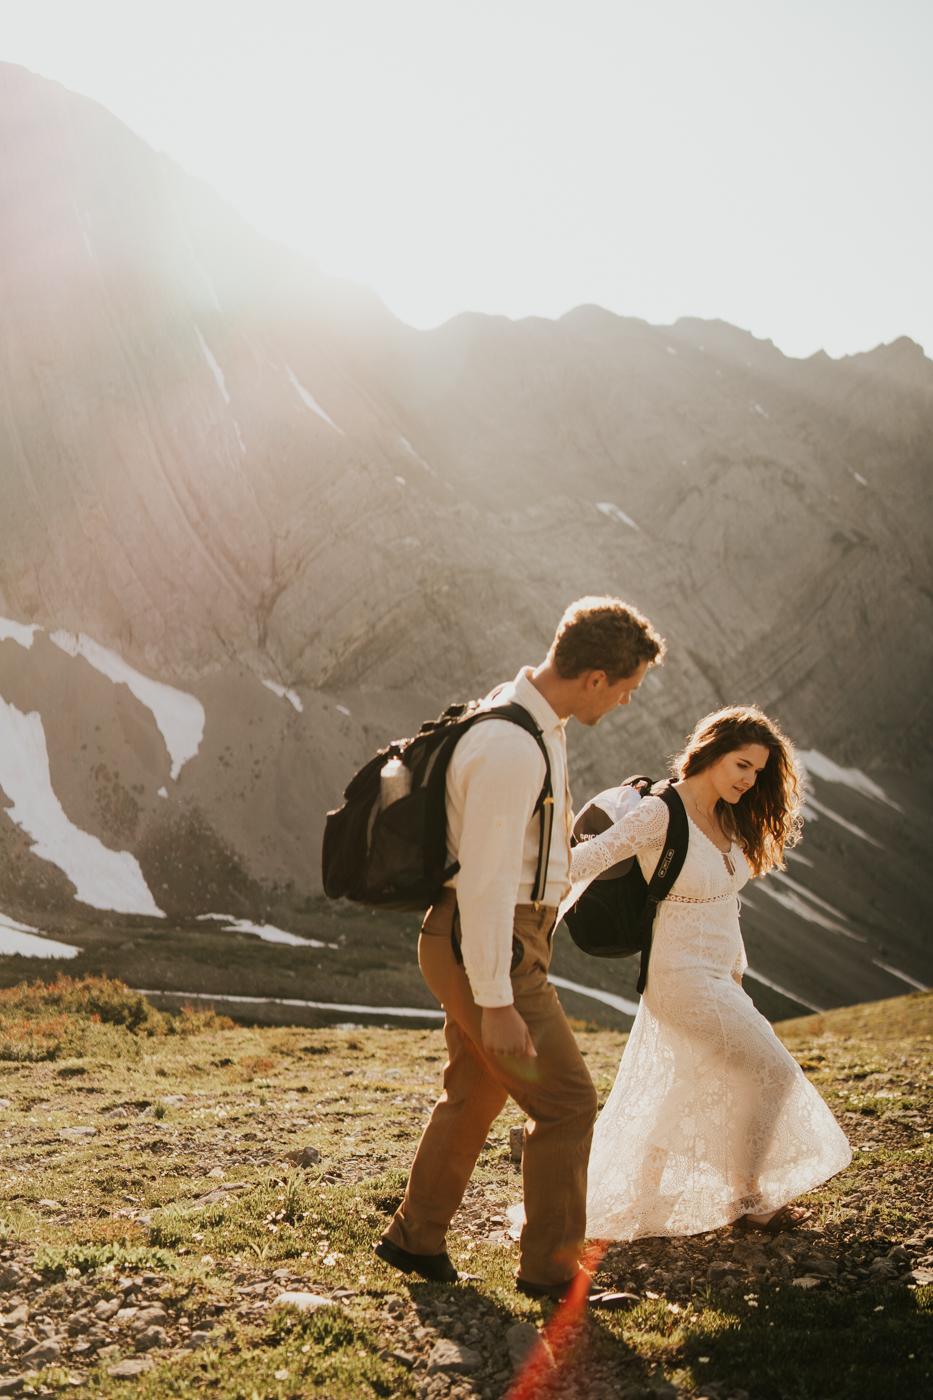 tyraephotography_photographer_wedding_elopement_engagement_photography-08457.jpg